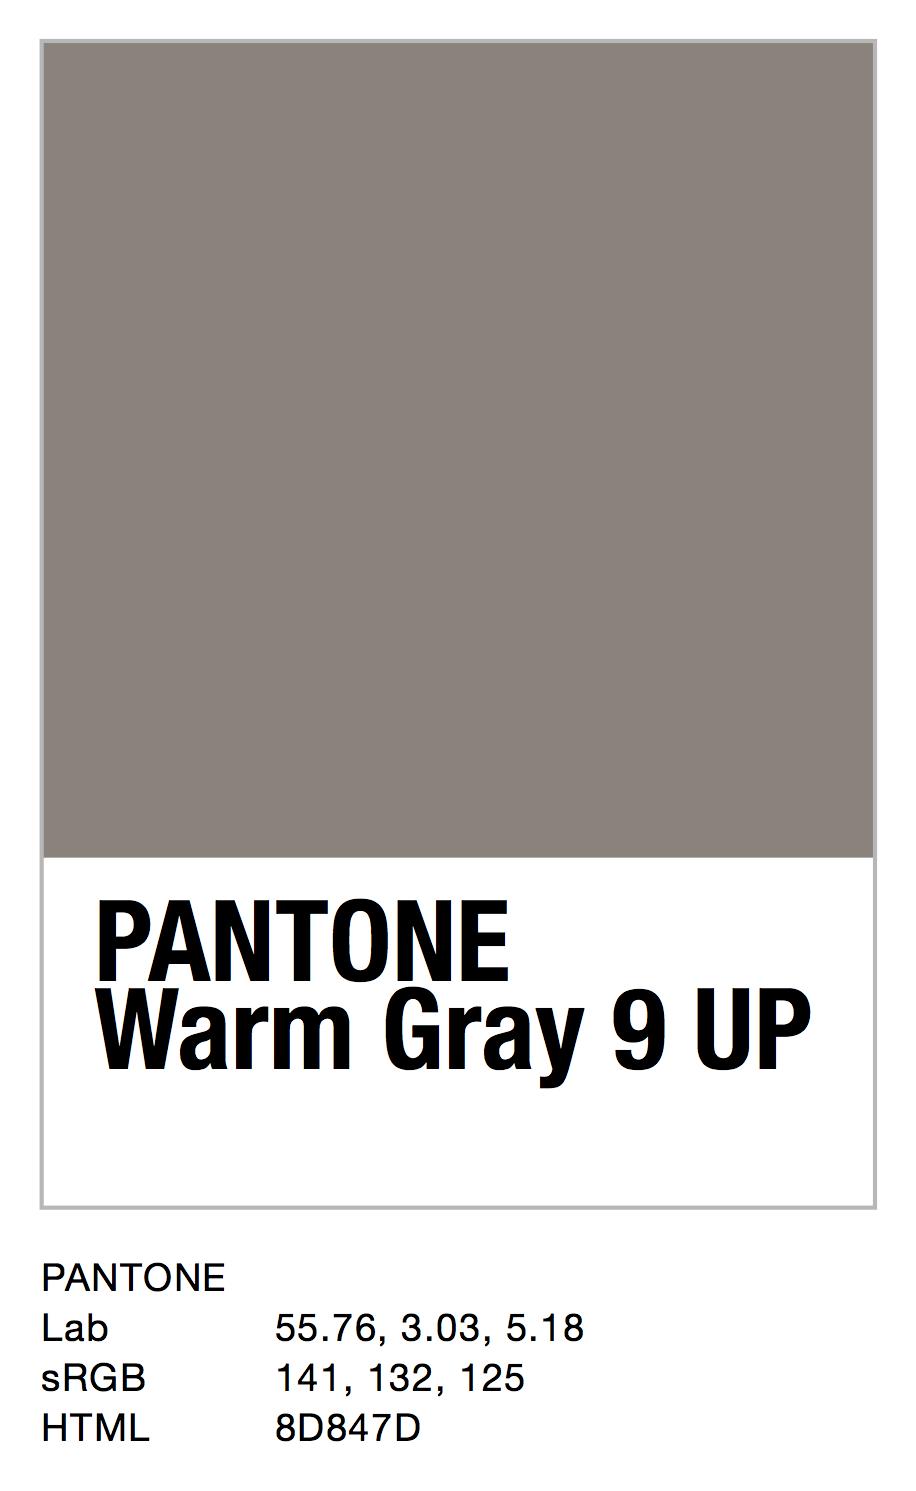 PANTONE Warm Gray 9 UP.jpg